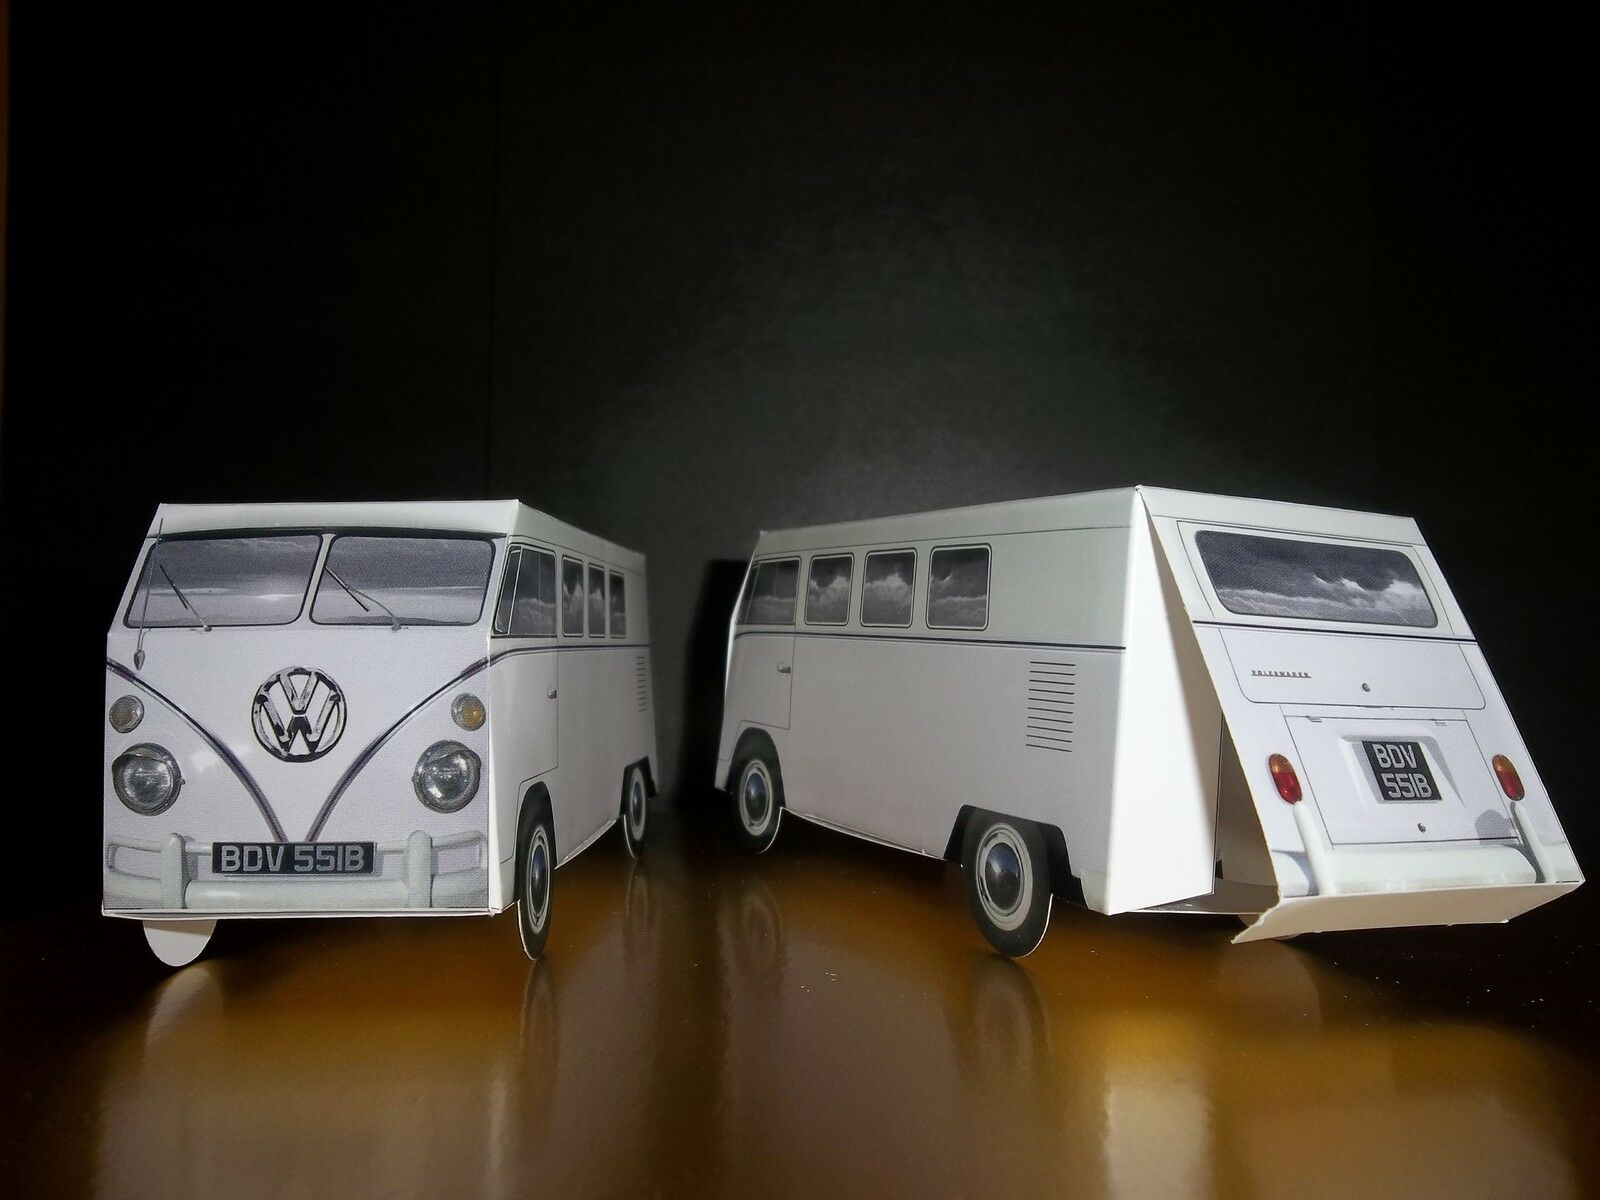 60 X Bianco Nozze VW Splitscreen Camper Van Nozze Bianco Favore VW Party Box Scatole Di Dolci 0ae5fc